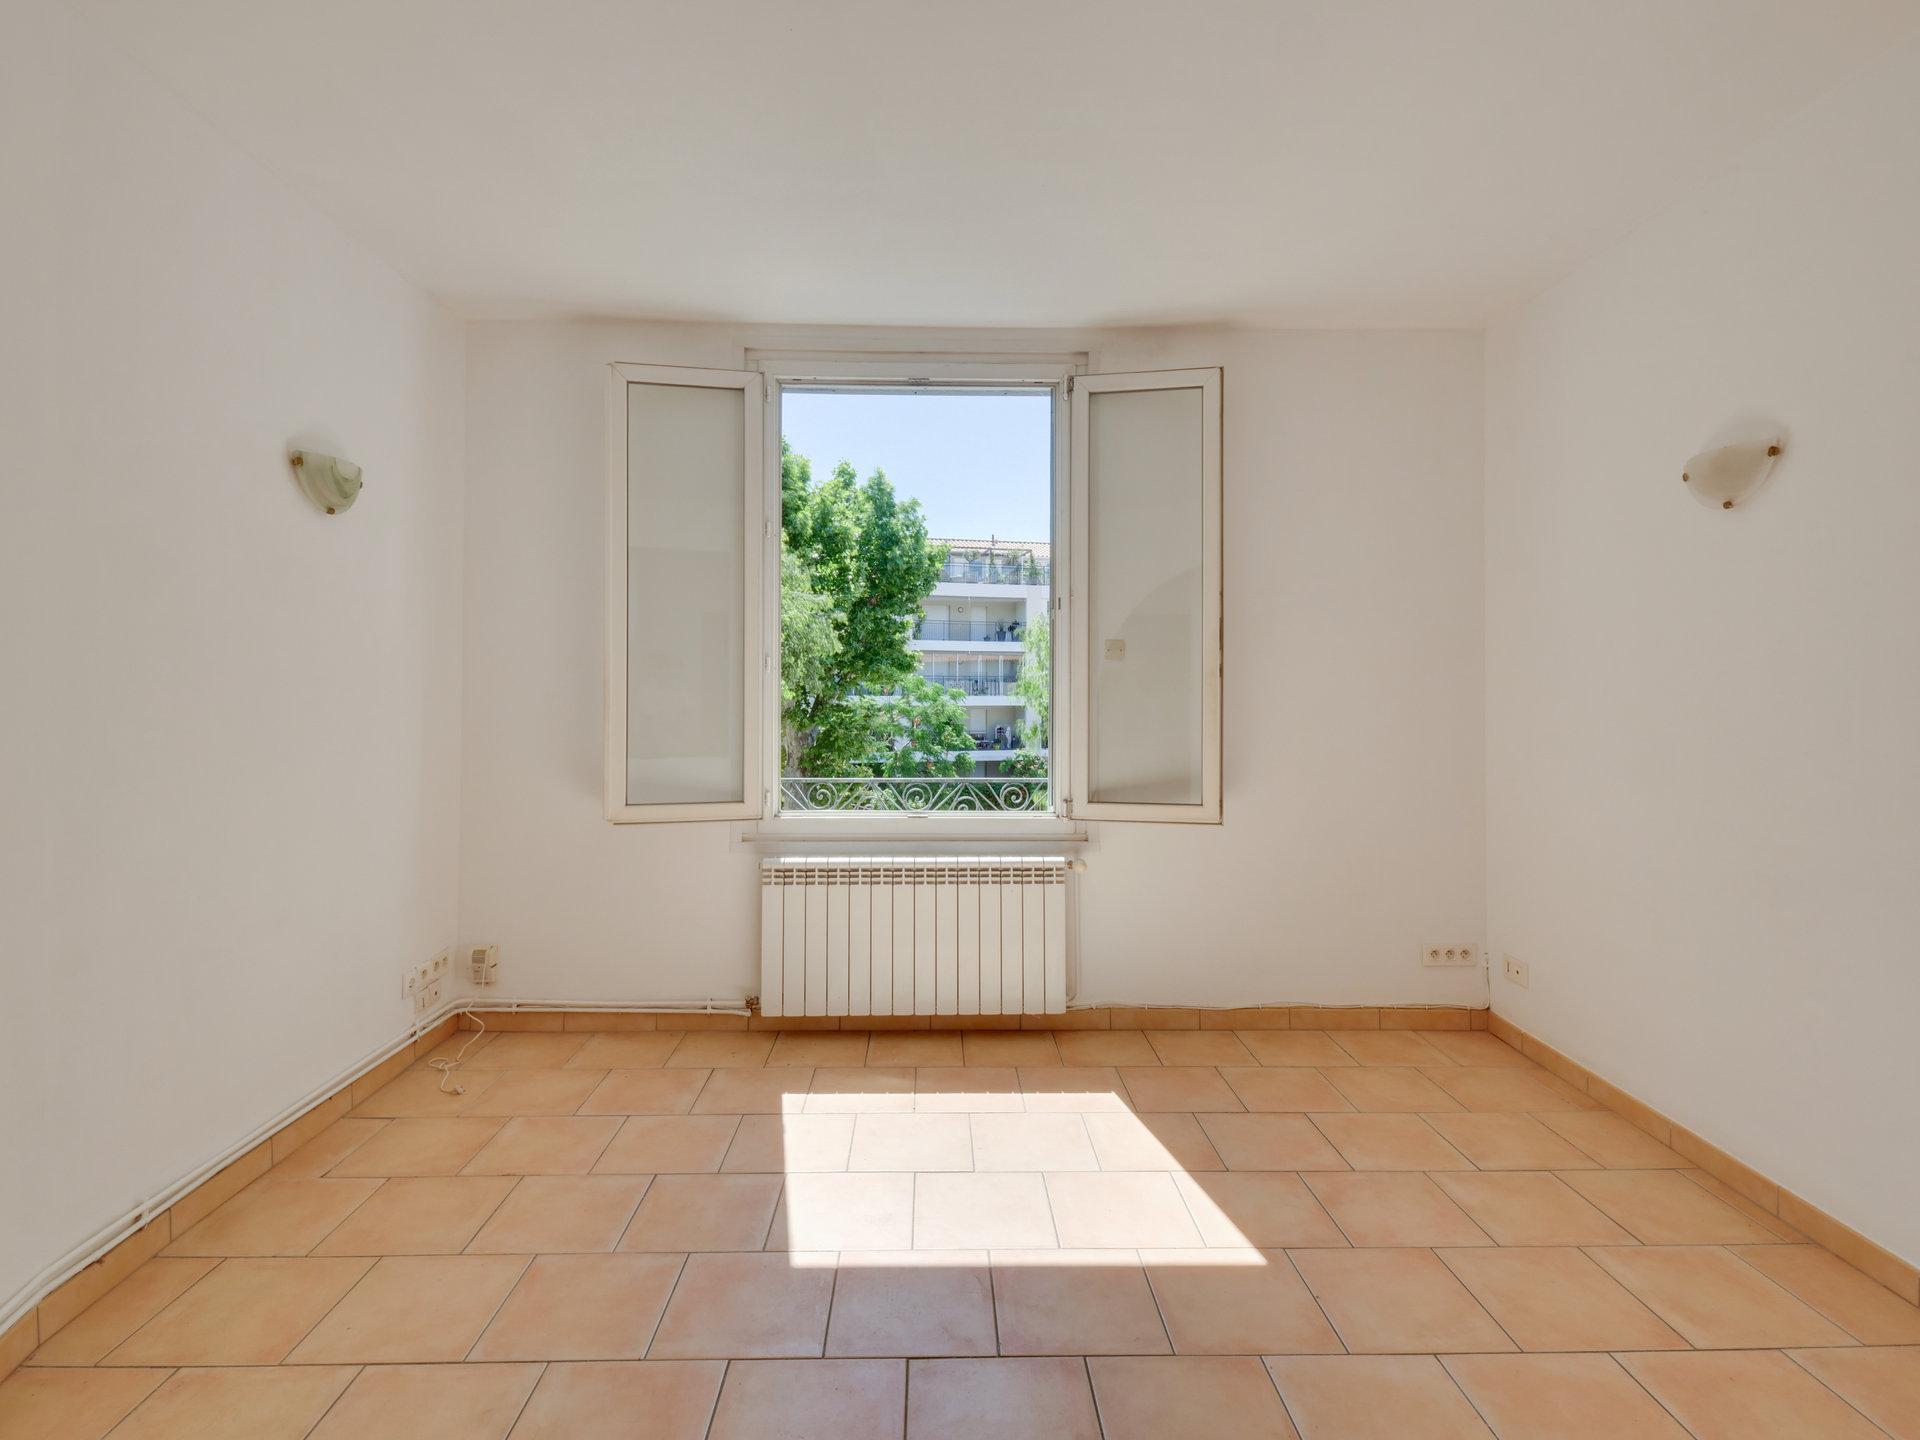 Vente appartement T3 - LA CIOTAT